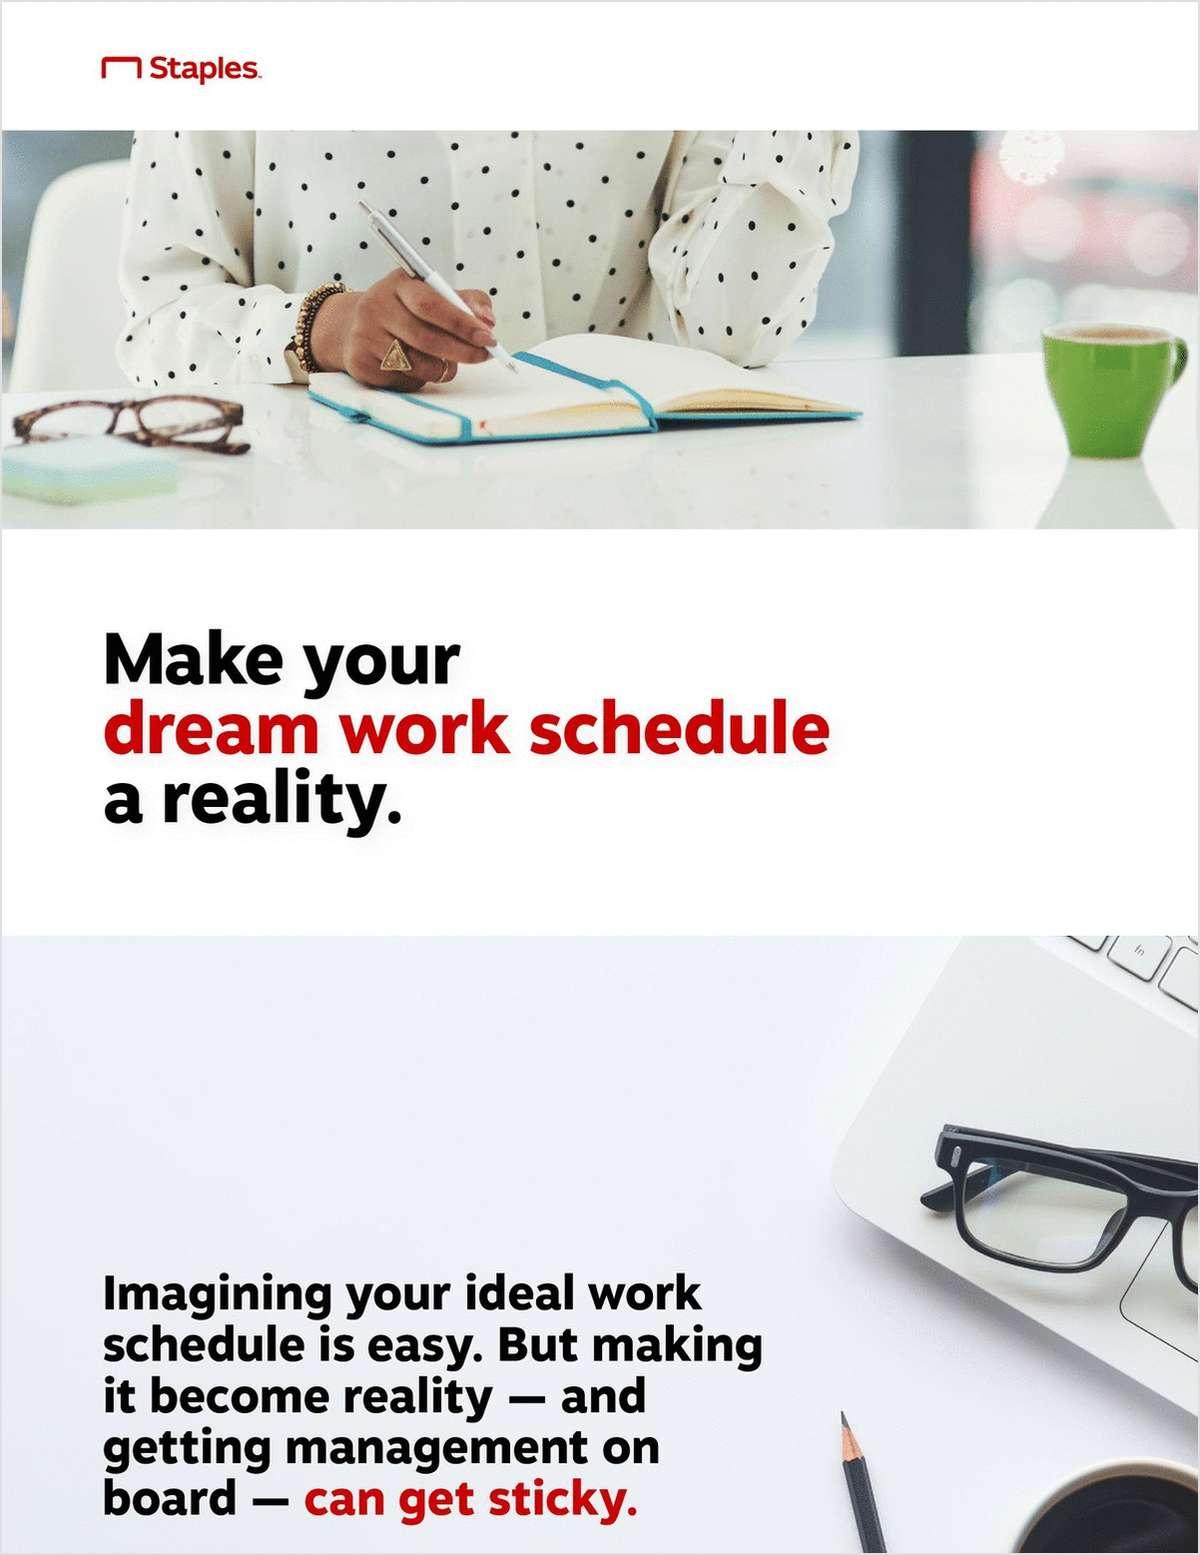 How to Make Your Dream Work Schedule Happen